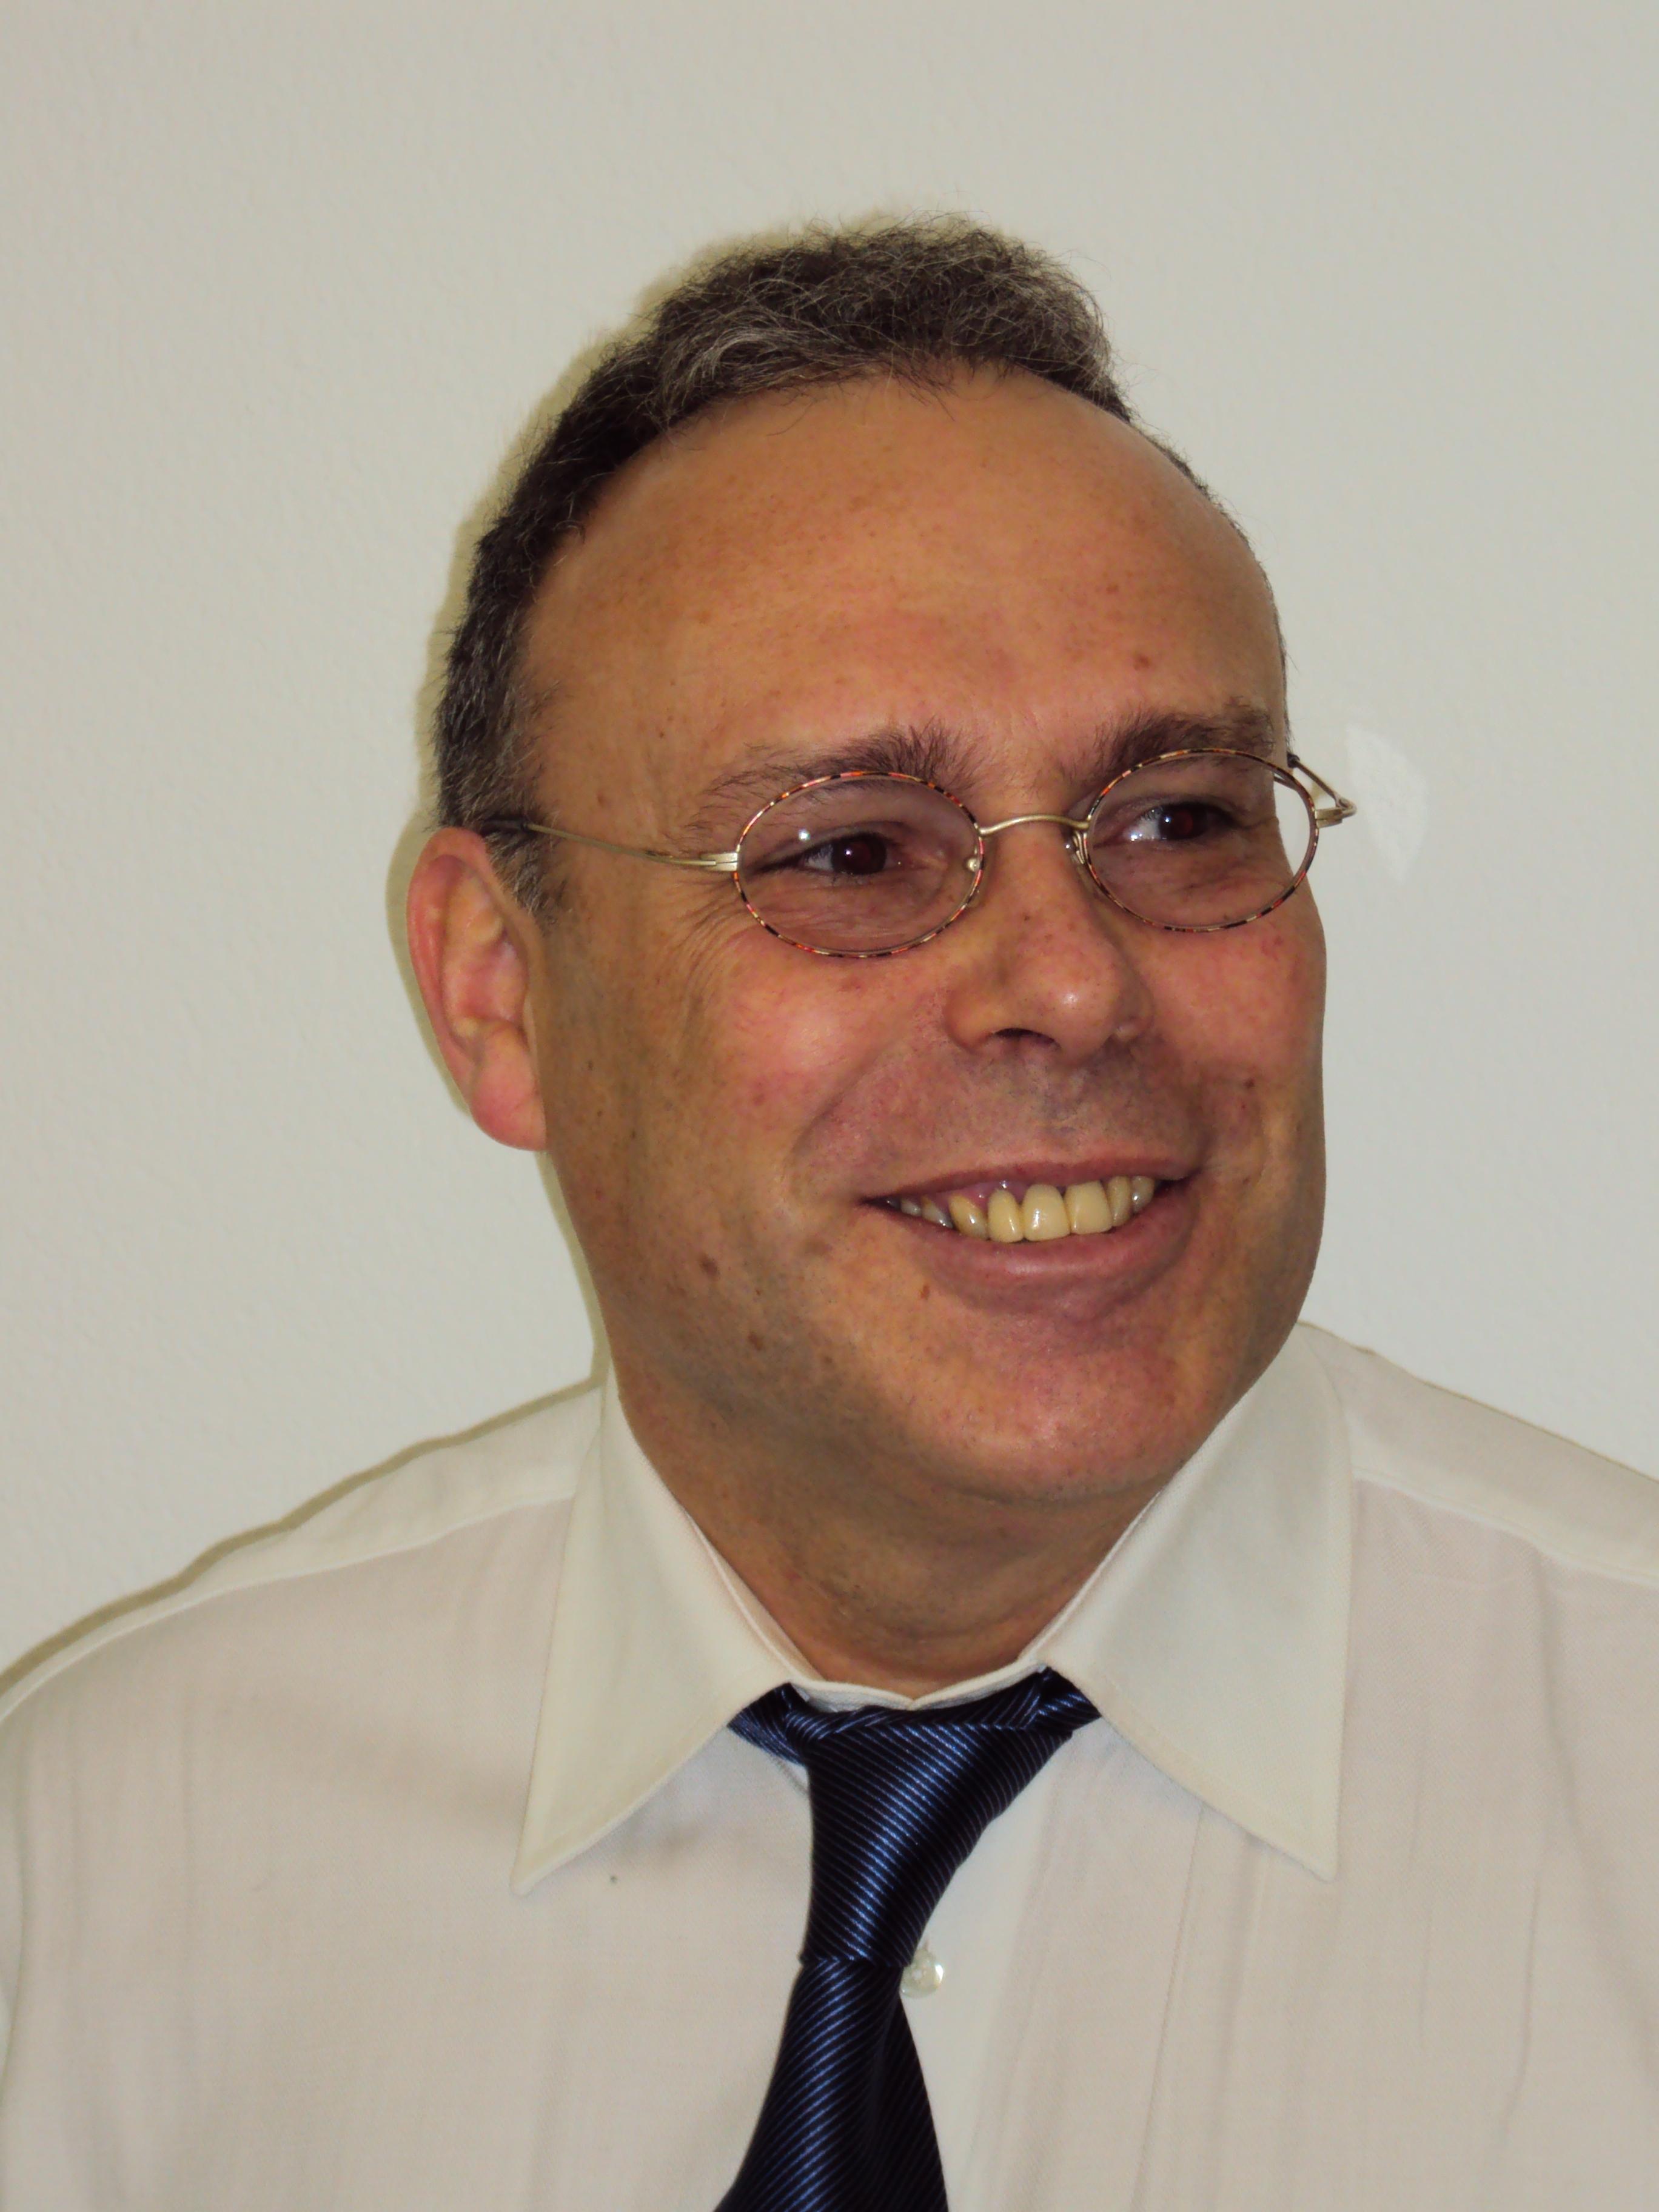 Sandro Sosio